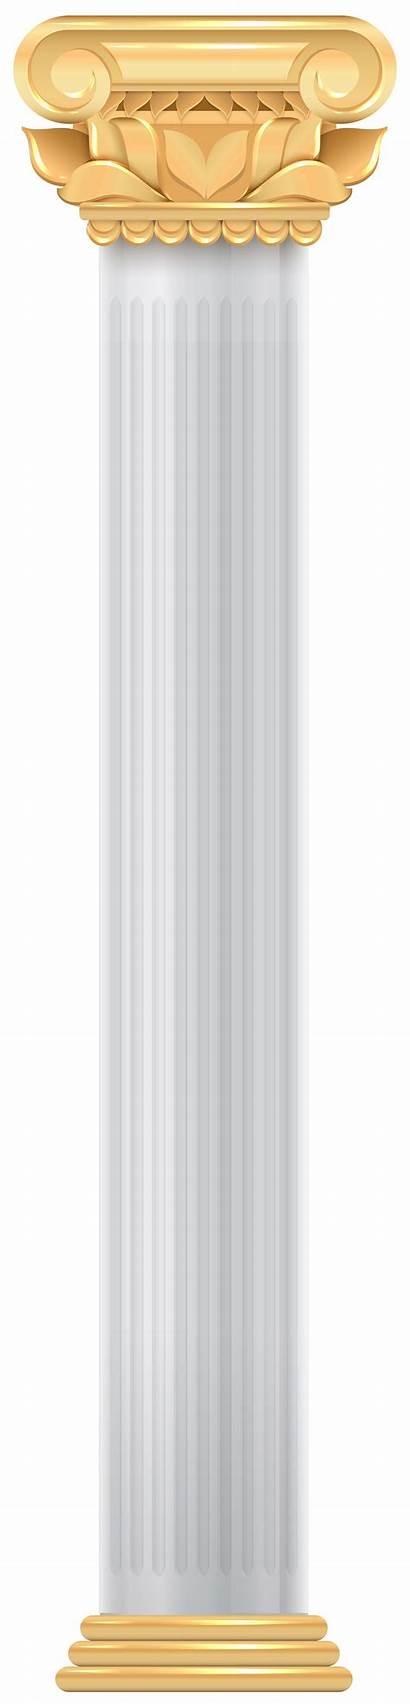 Column Clip Clipart Yopriceville Transparent